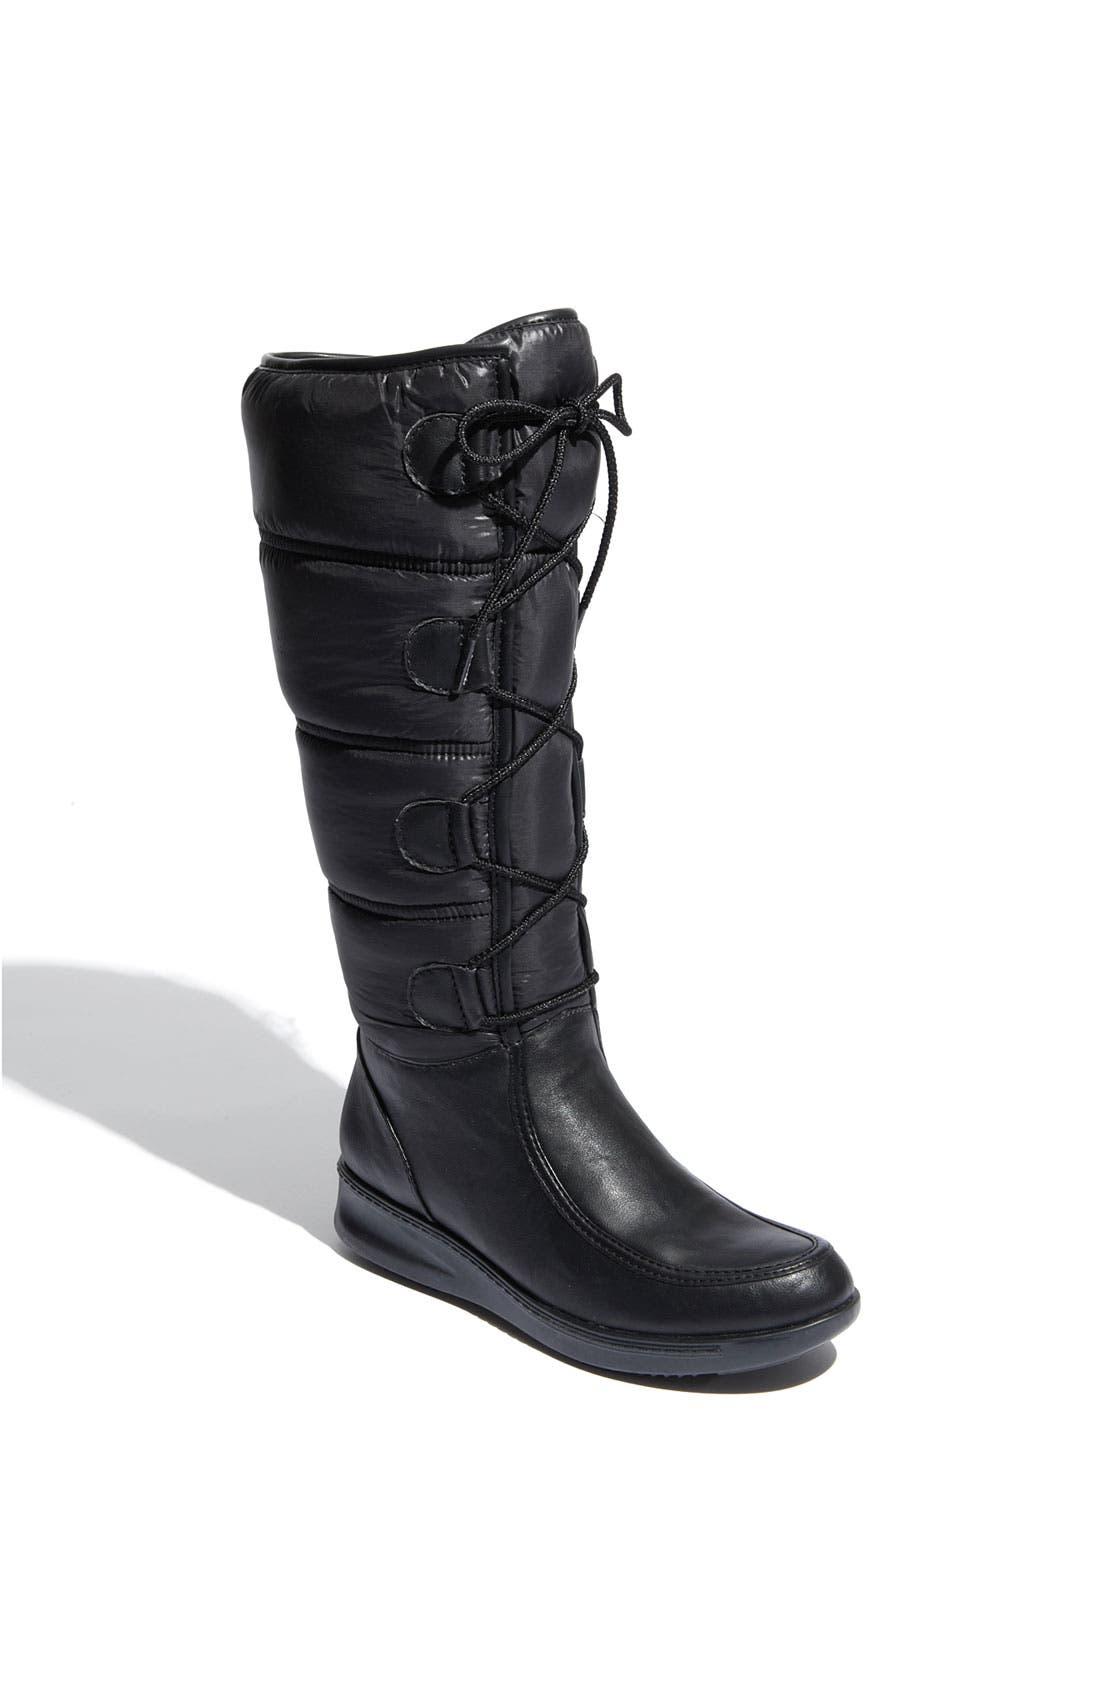 Main Image - Naturalizer 'Windy' Boot